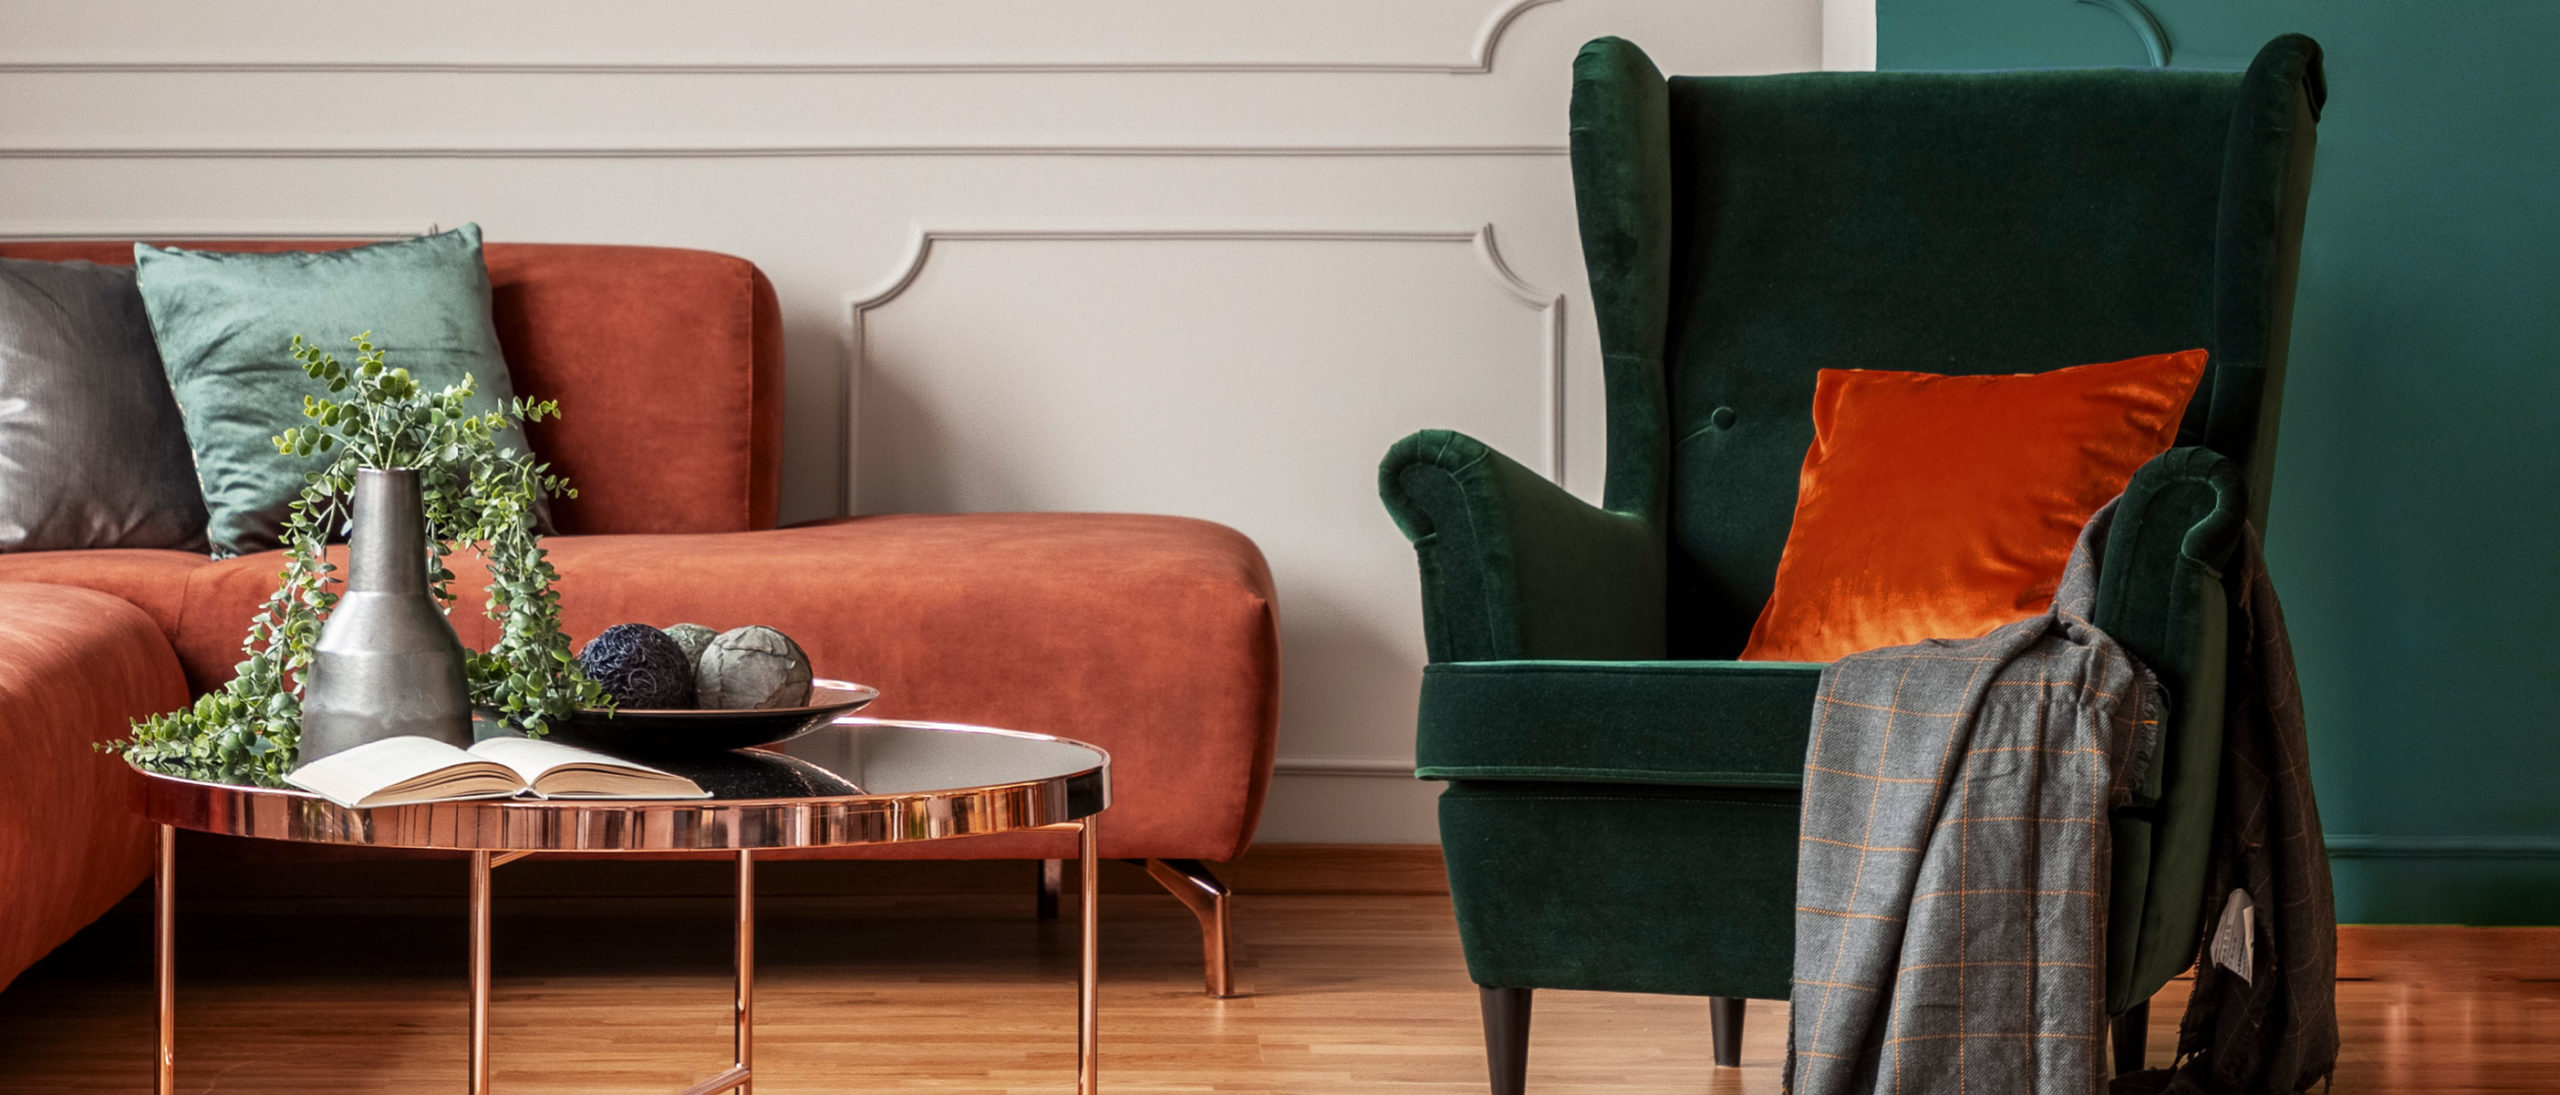 5 DIY Home Improvements to Tackle This Season